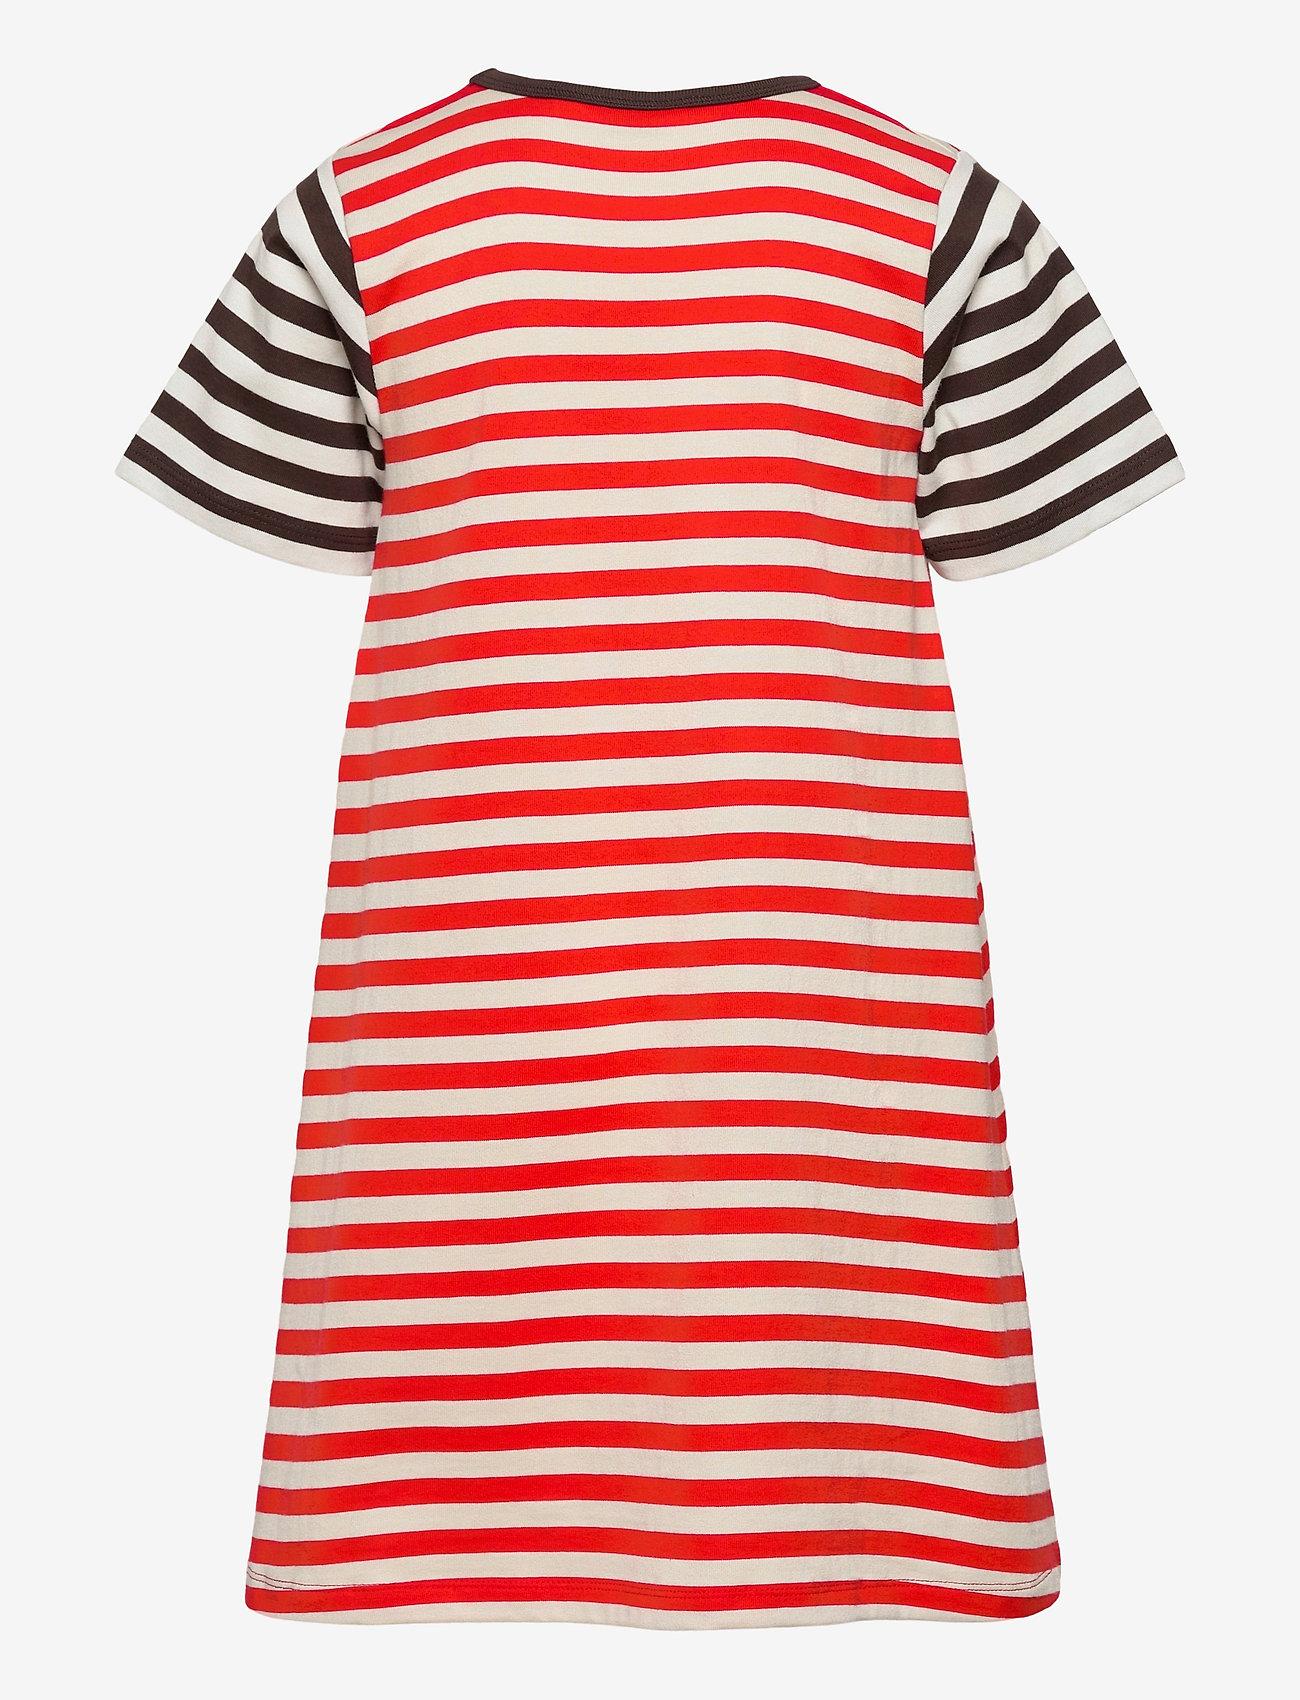 Marimekko - AHDE TASARAITA DRESS - sukienki - orange red, light beige - 1